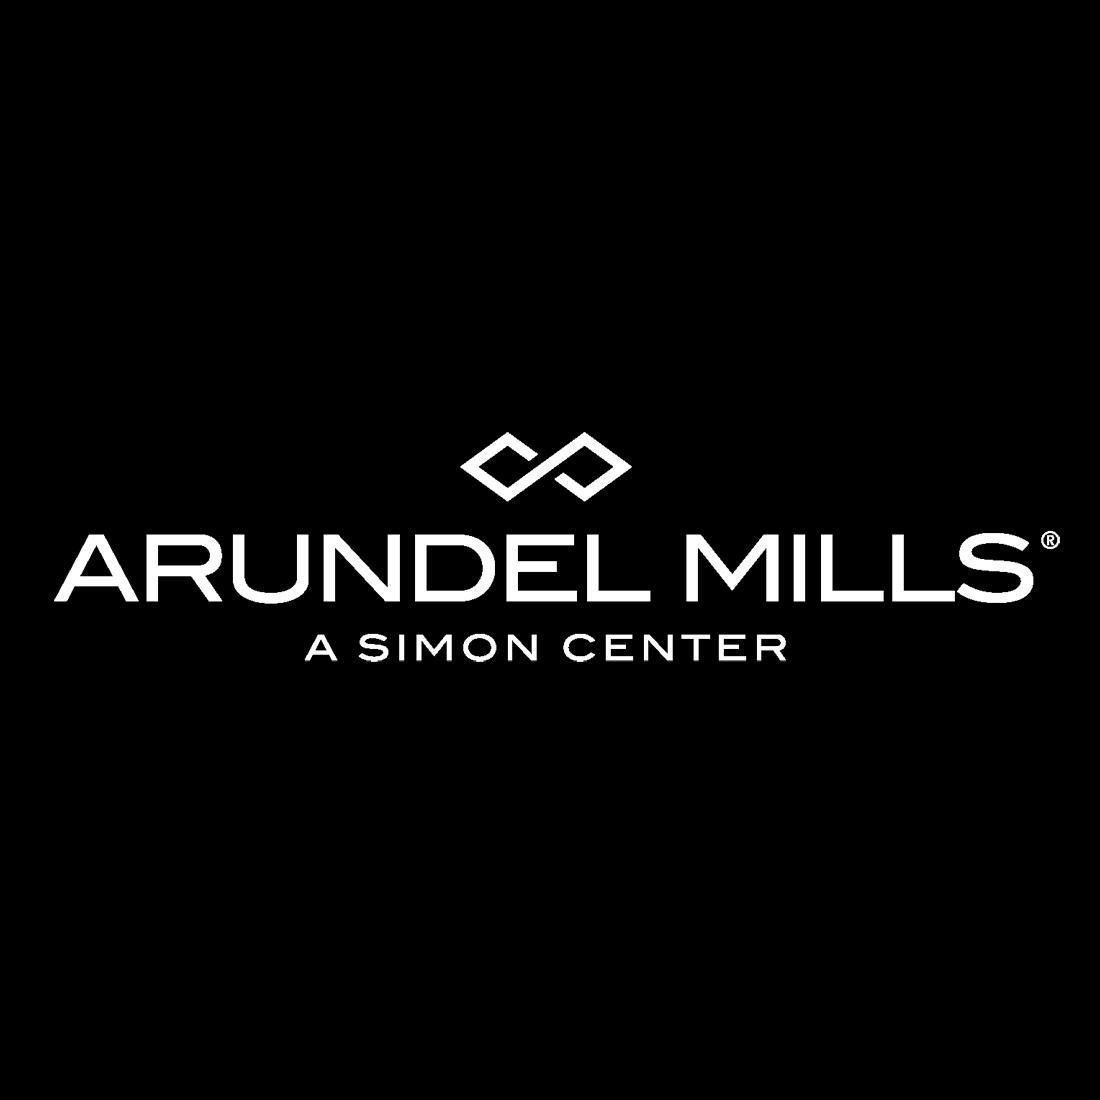 Arundel Mills - Hanover, MD - Factory Outlet Stores